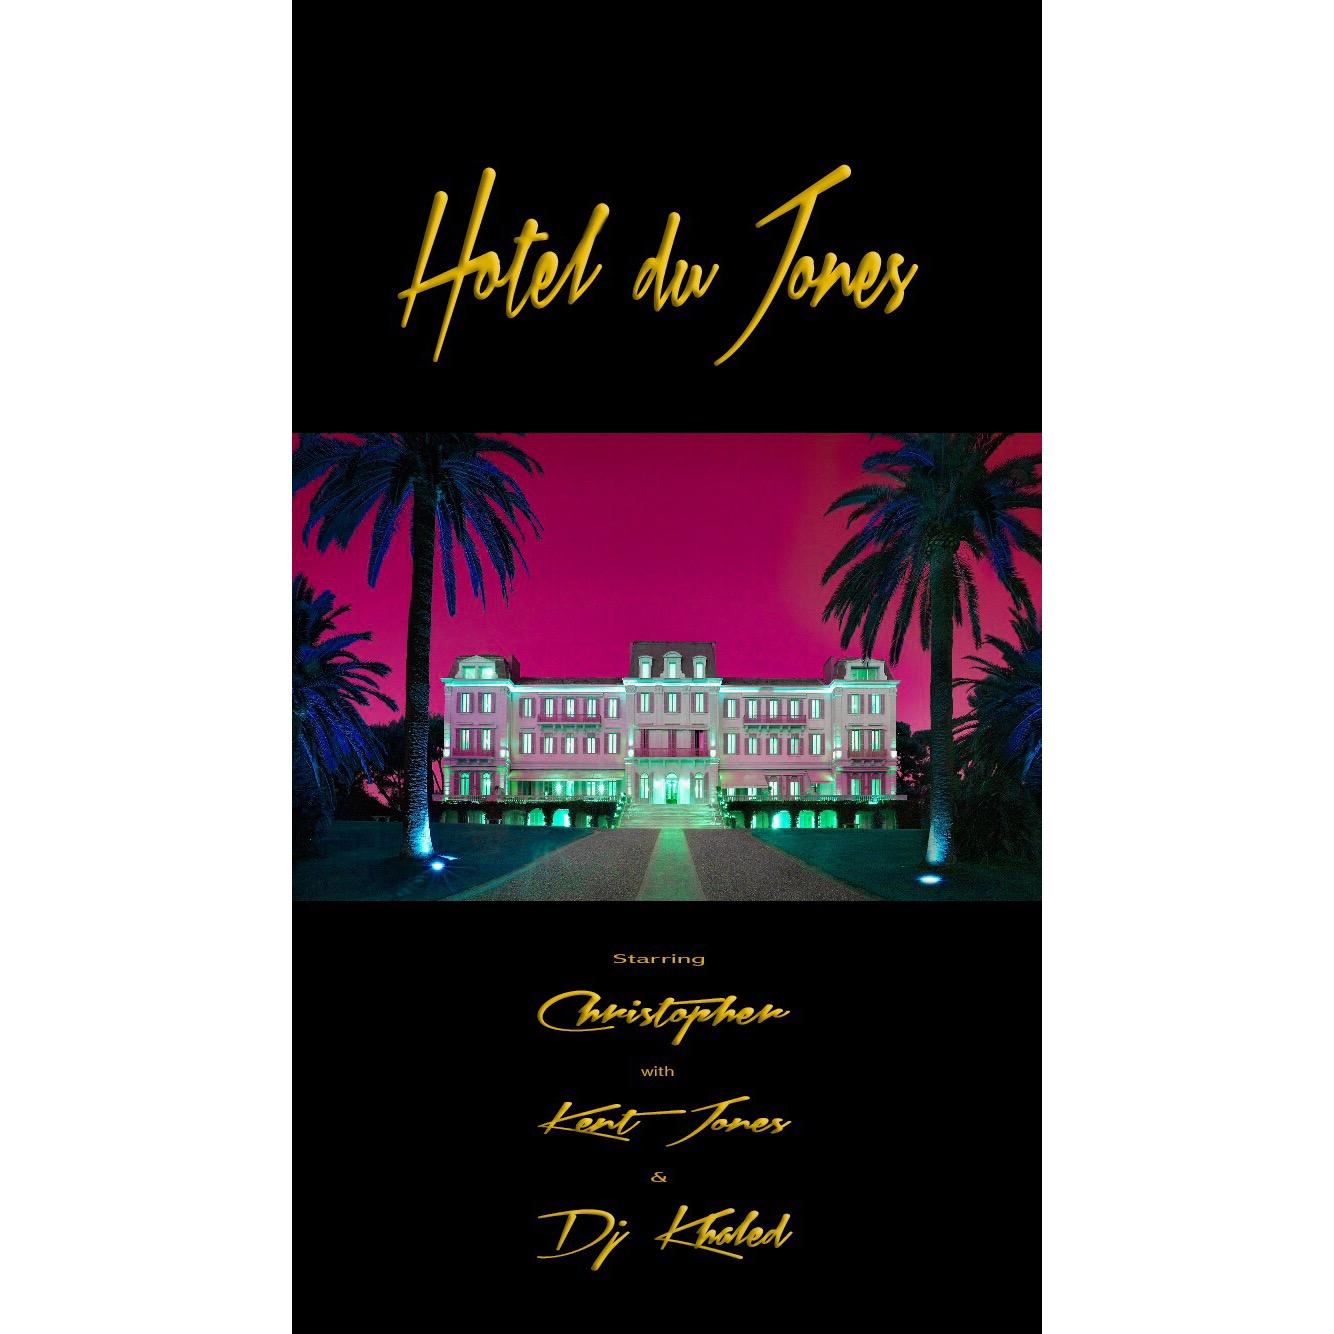 CHRISTOPHER – Hotel Du Jones [EP]